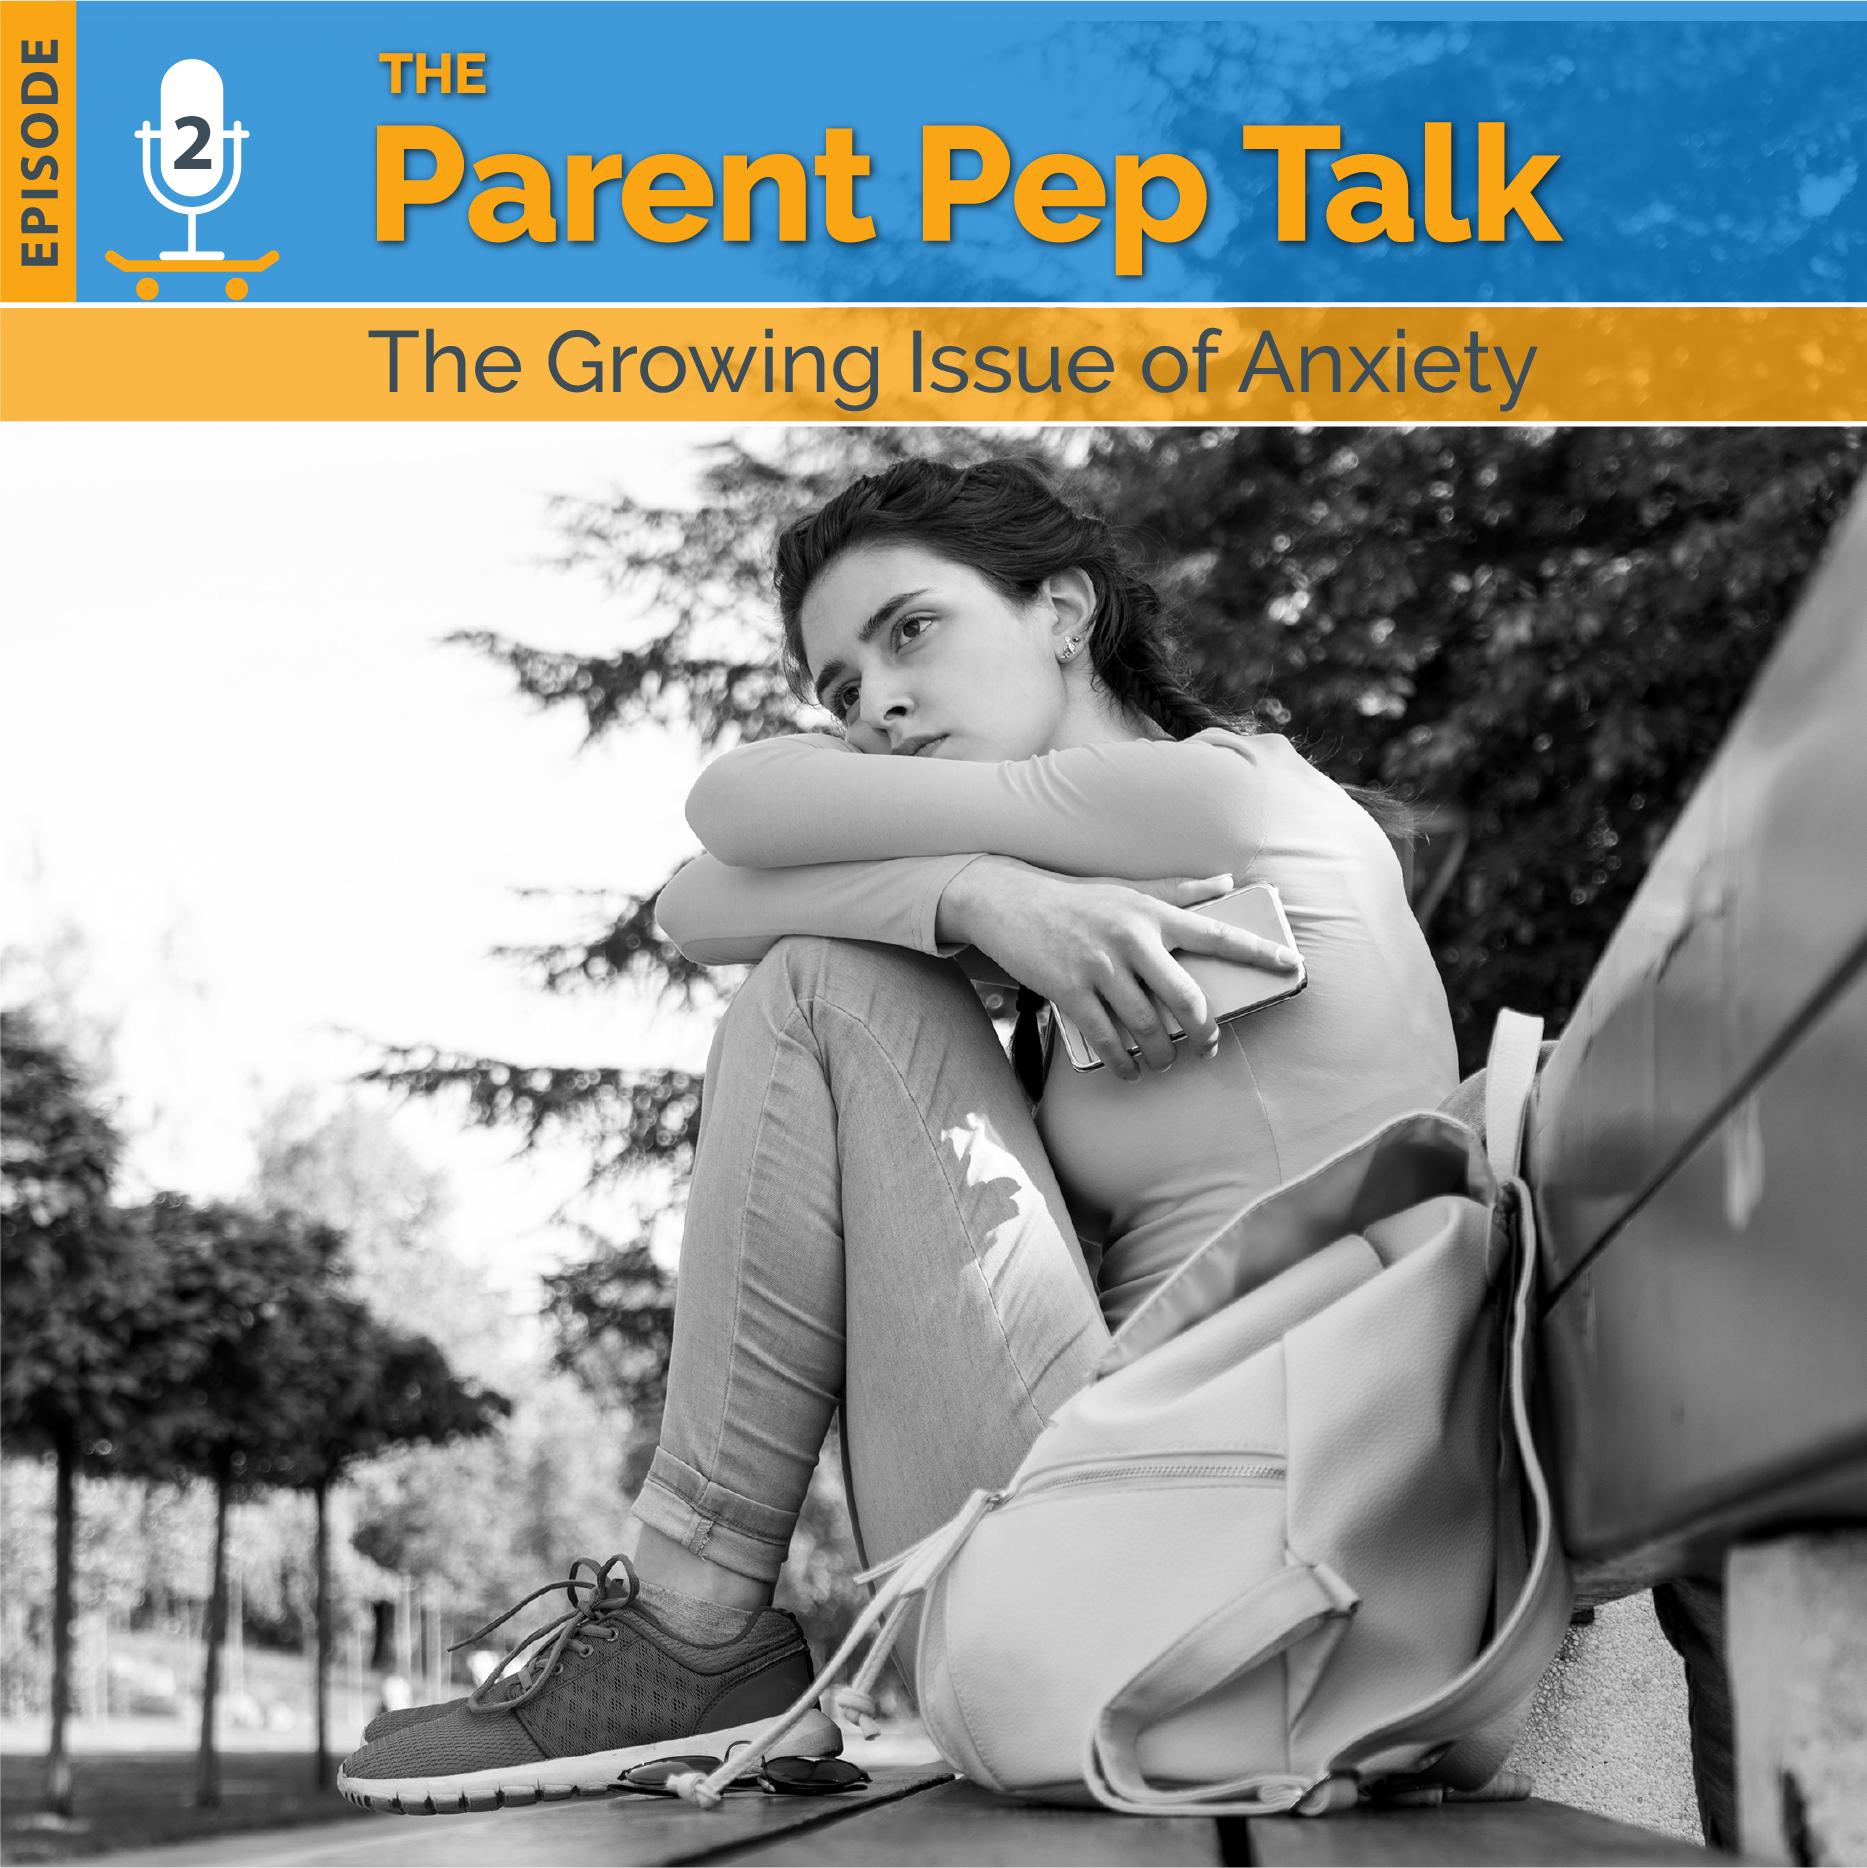 Parent Pep Talk episode 2